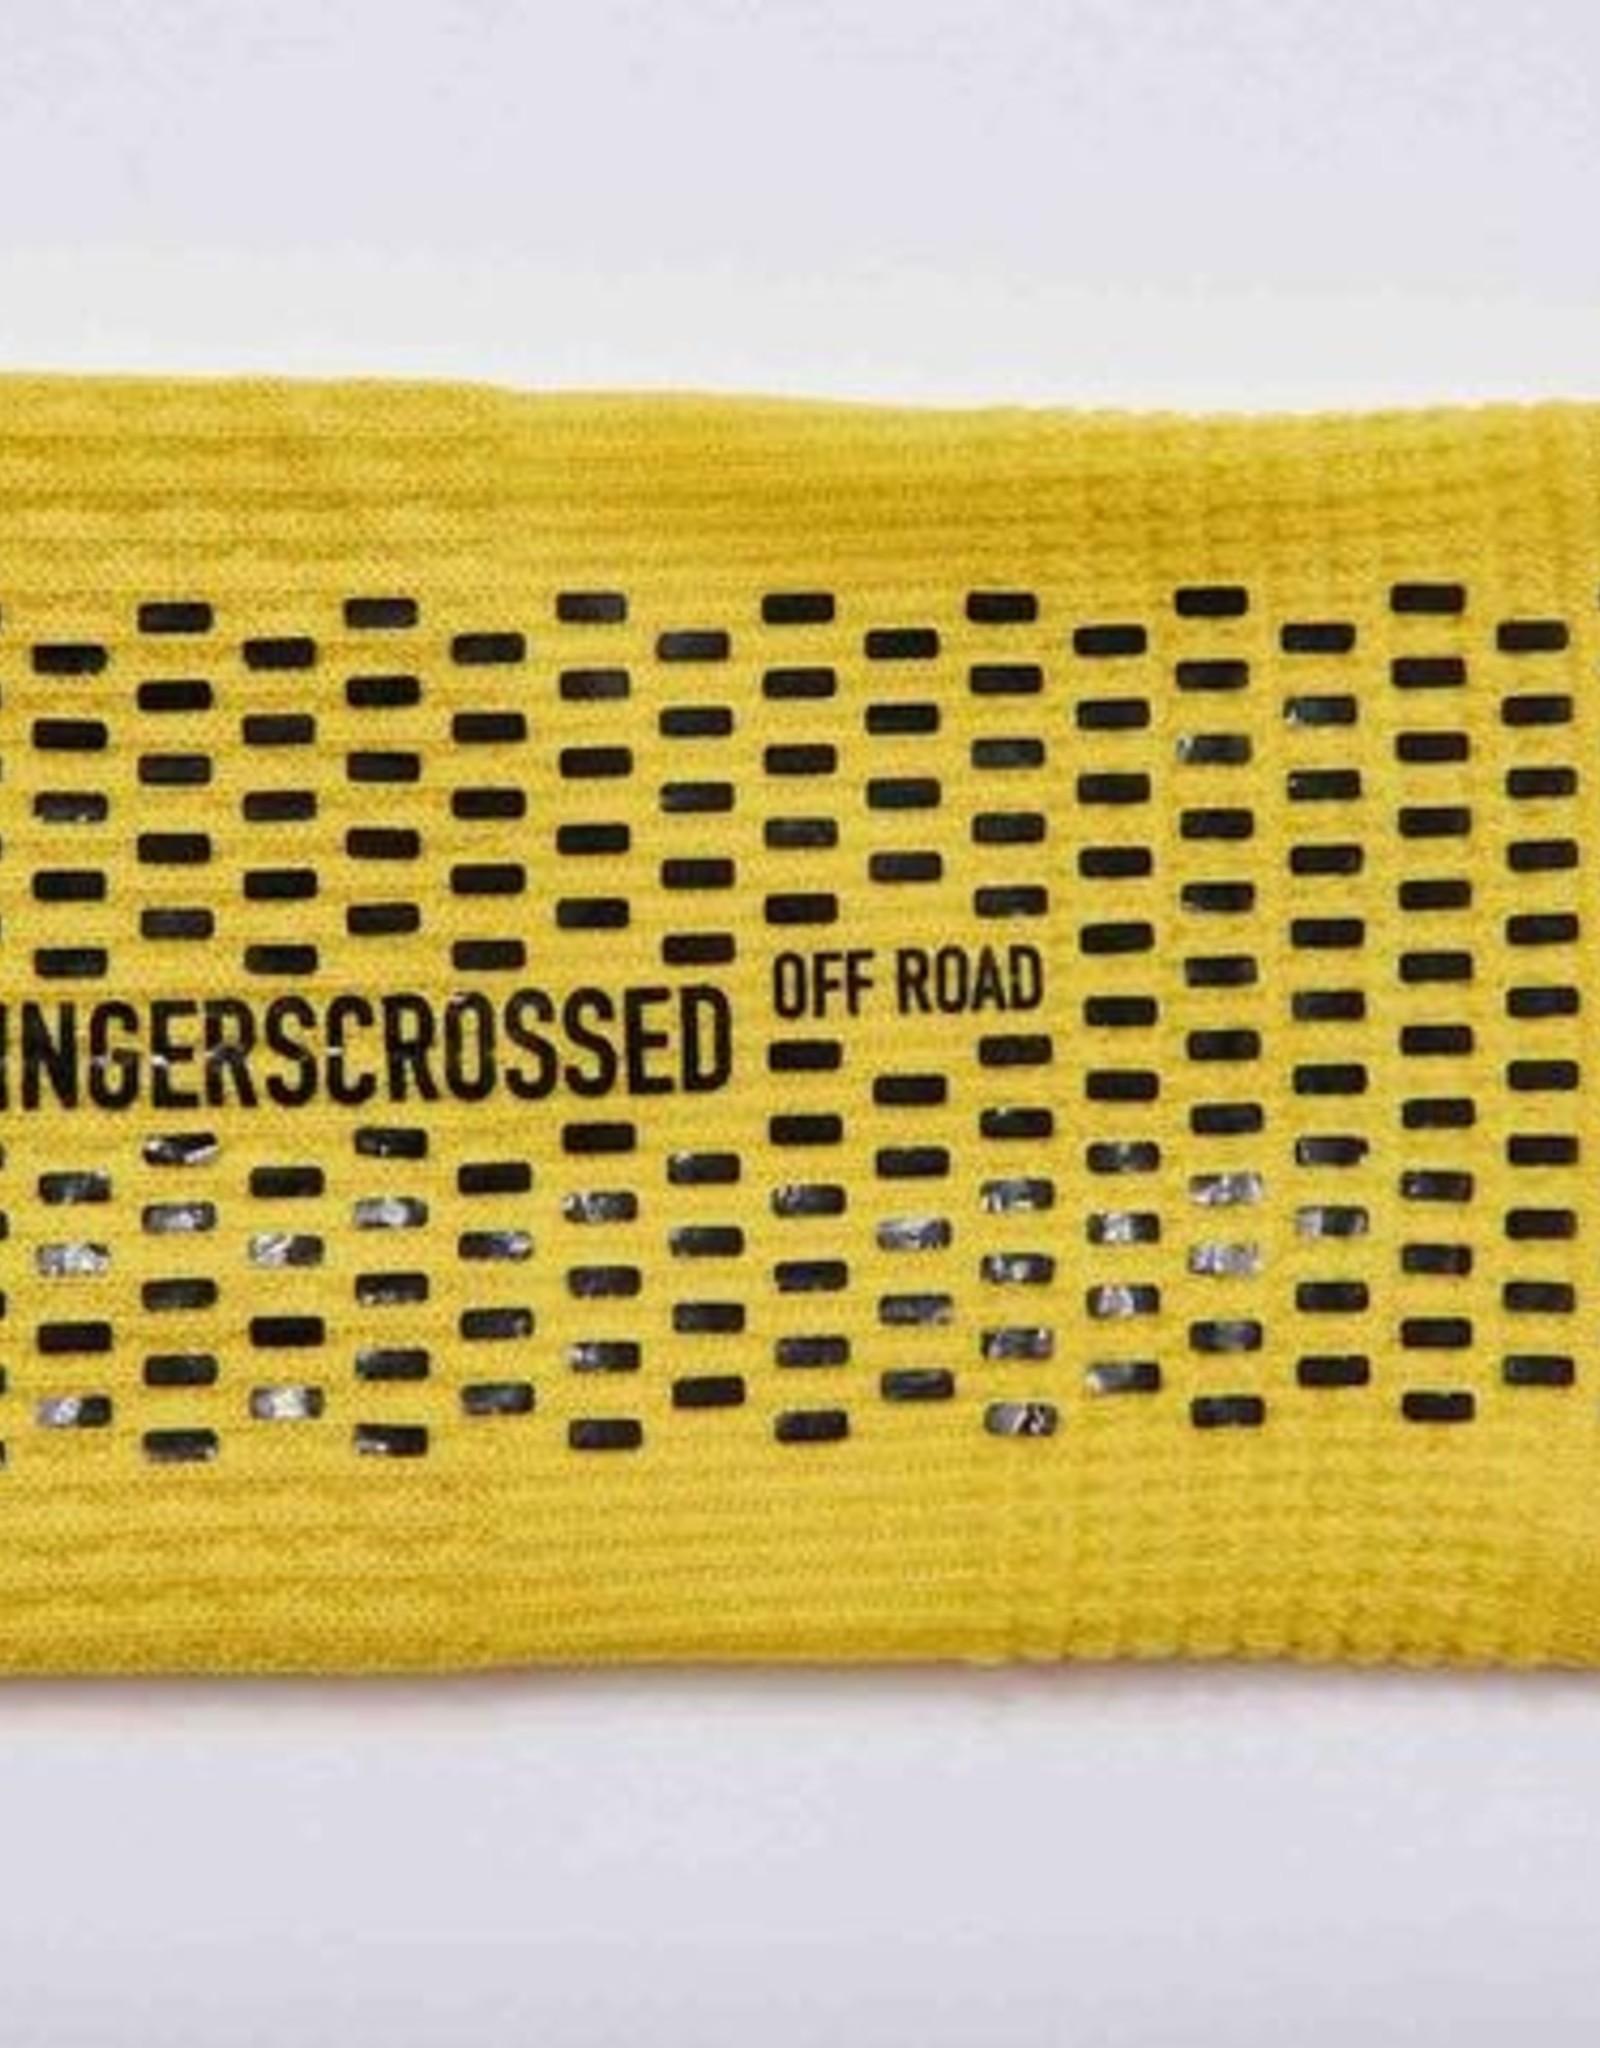 Fingerscrossed Off Road Fietssokken - Mittelscharf